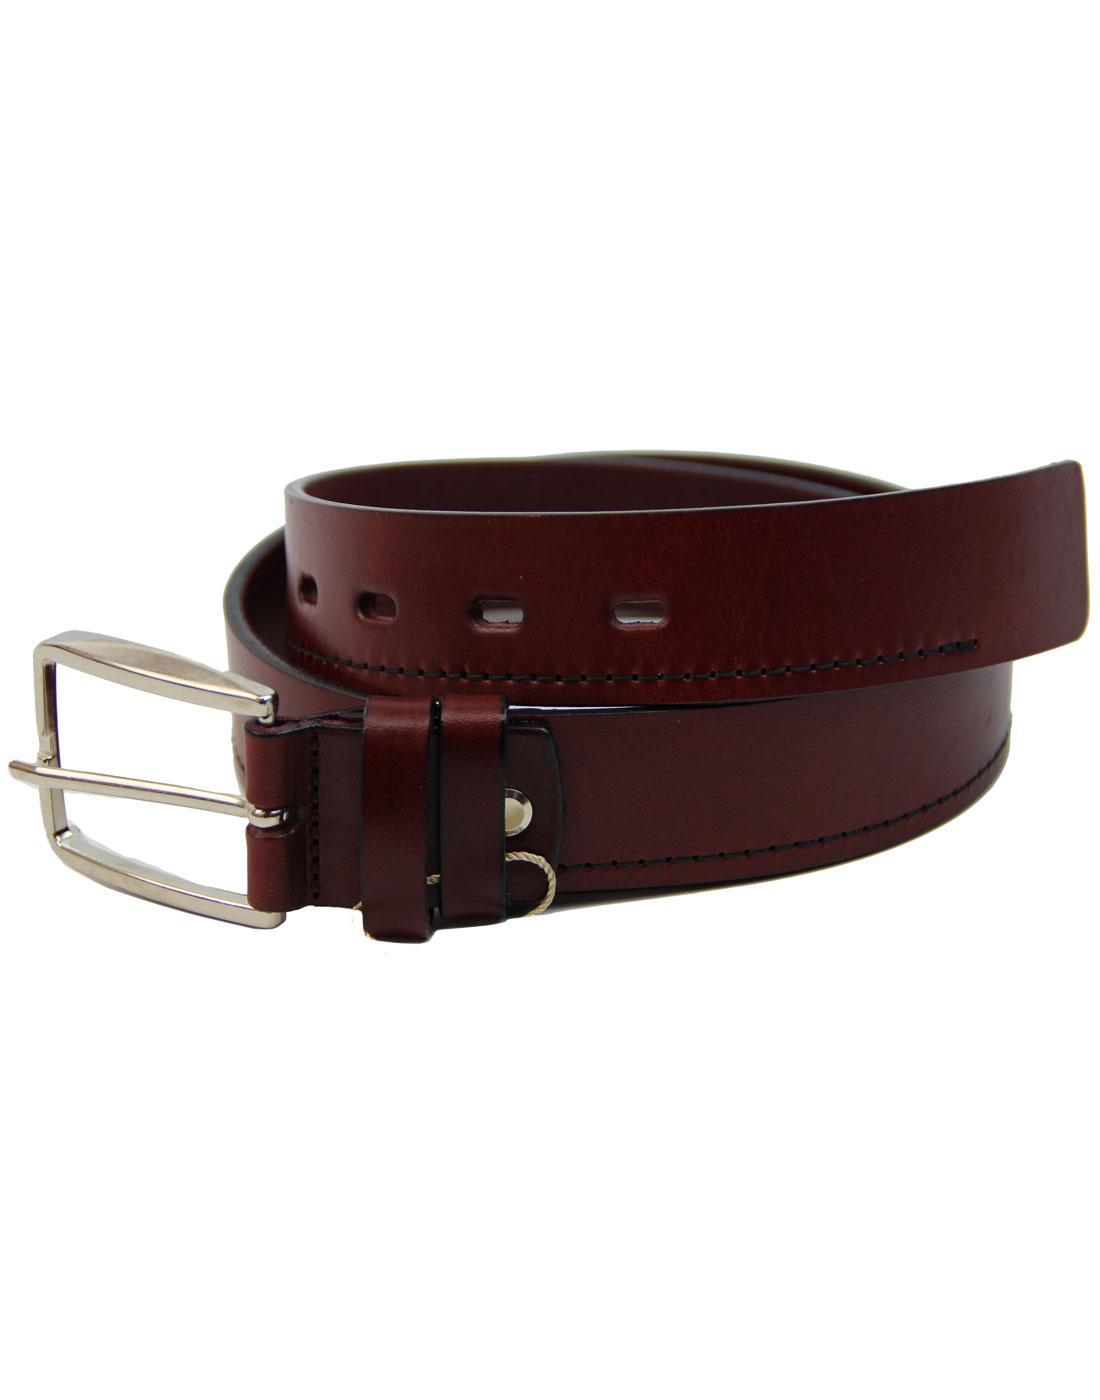 LACUZZO 60s Mod Black Stitch Leather Belt BURGUNDY